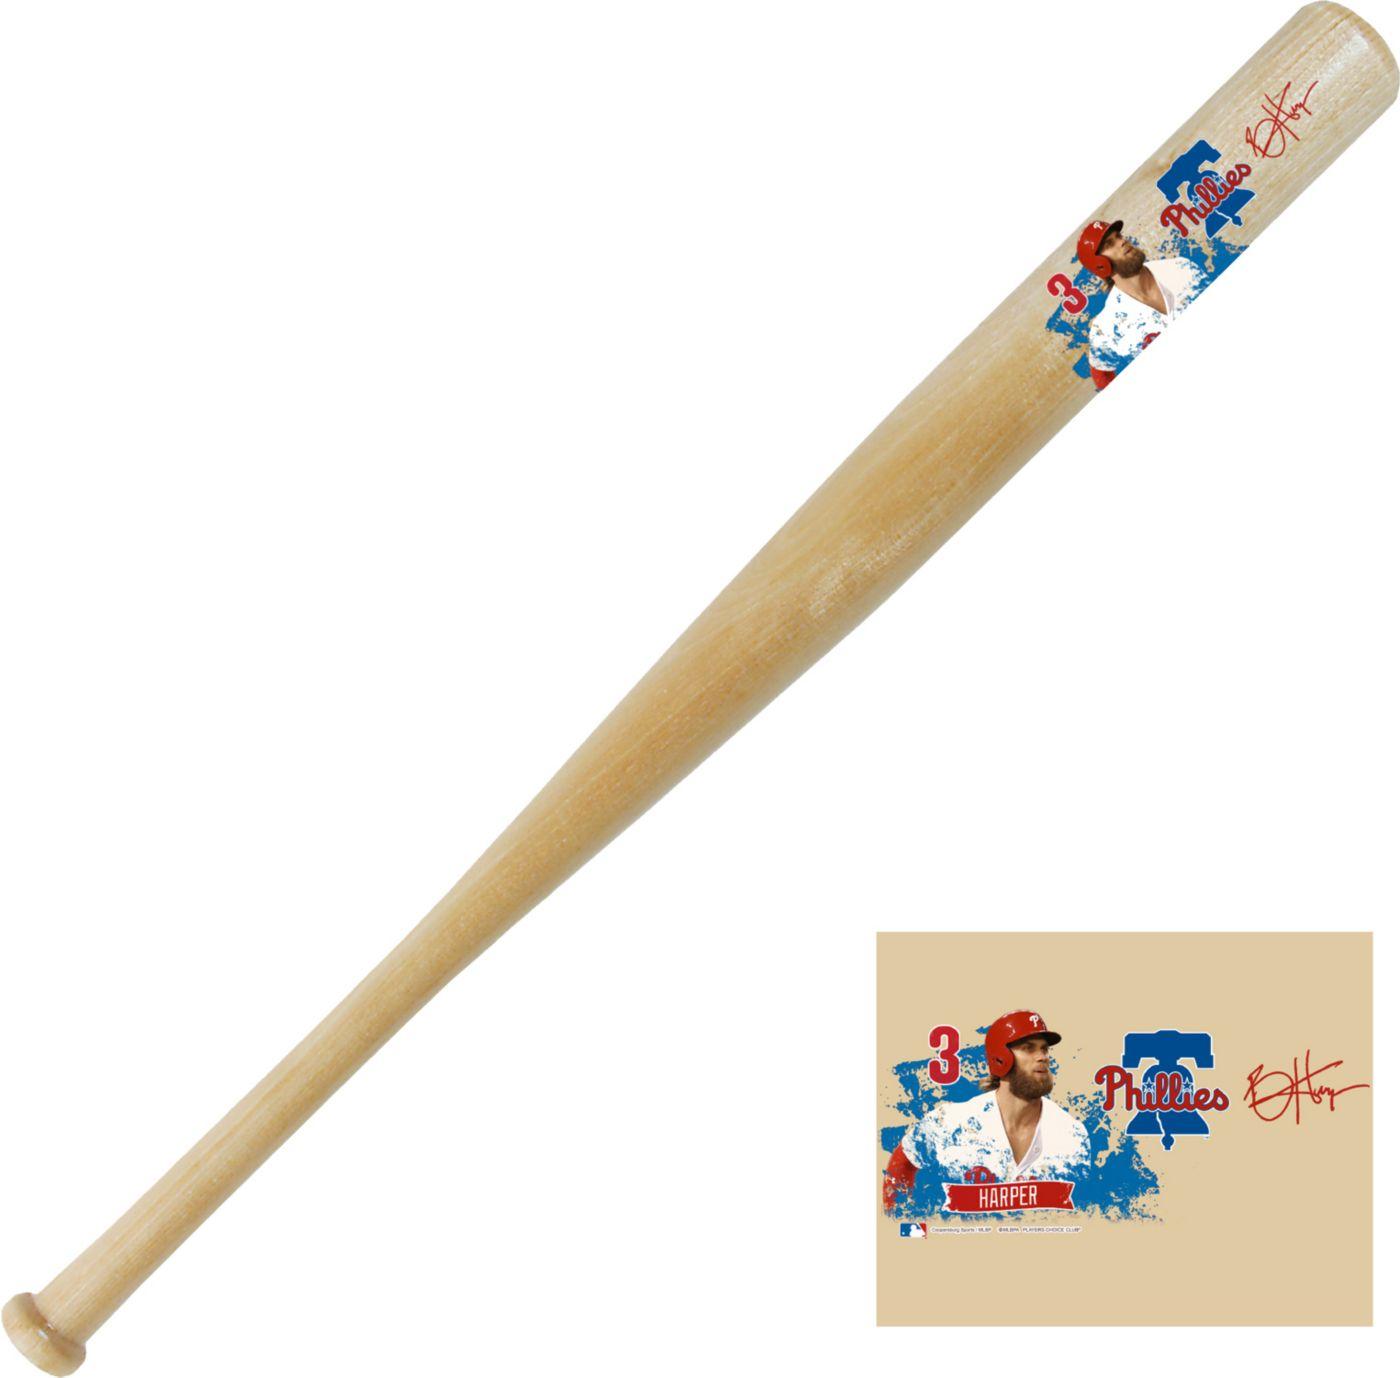 Coopersburg Sports Philadelphia Phillies Bryce Harper Mini Bat